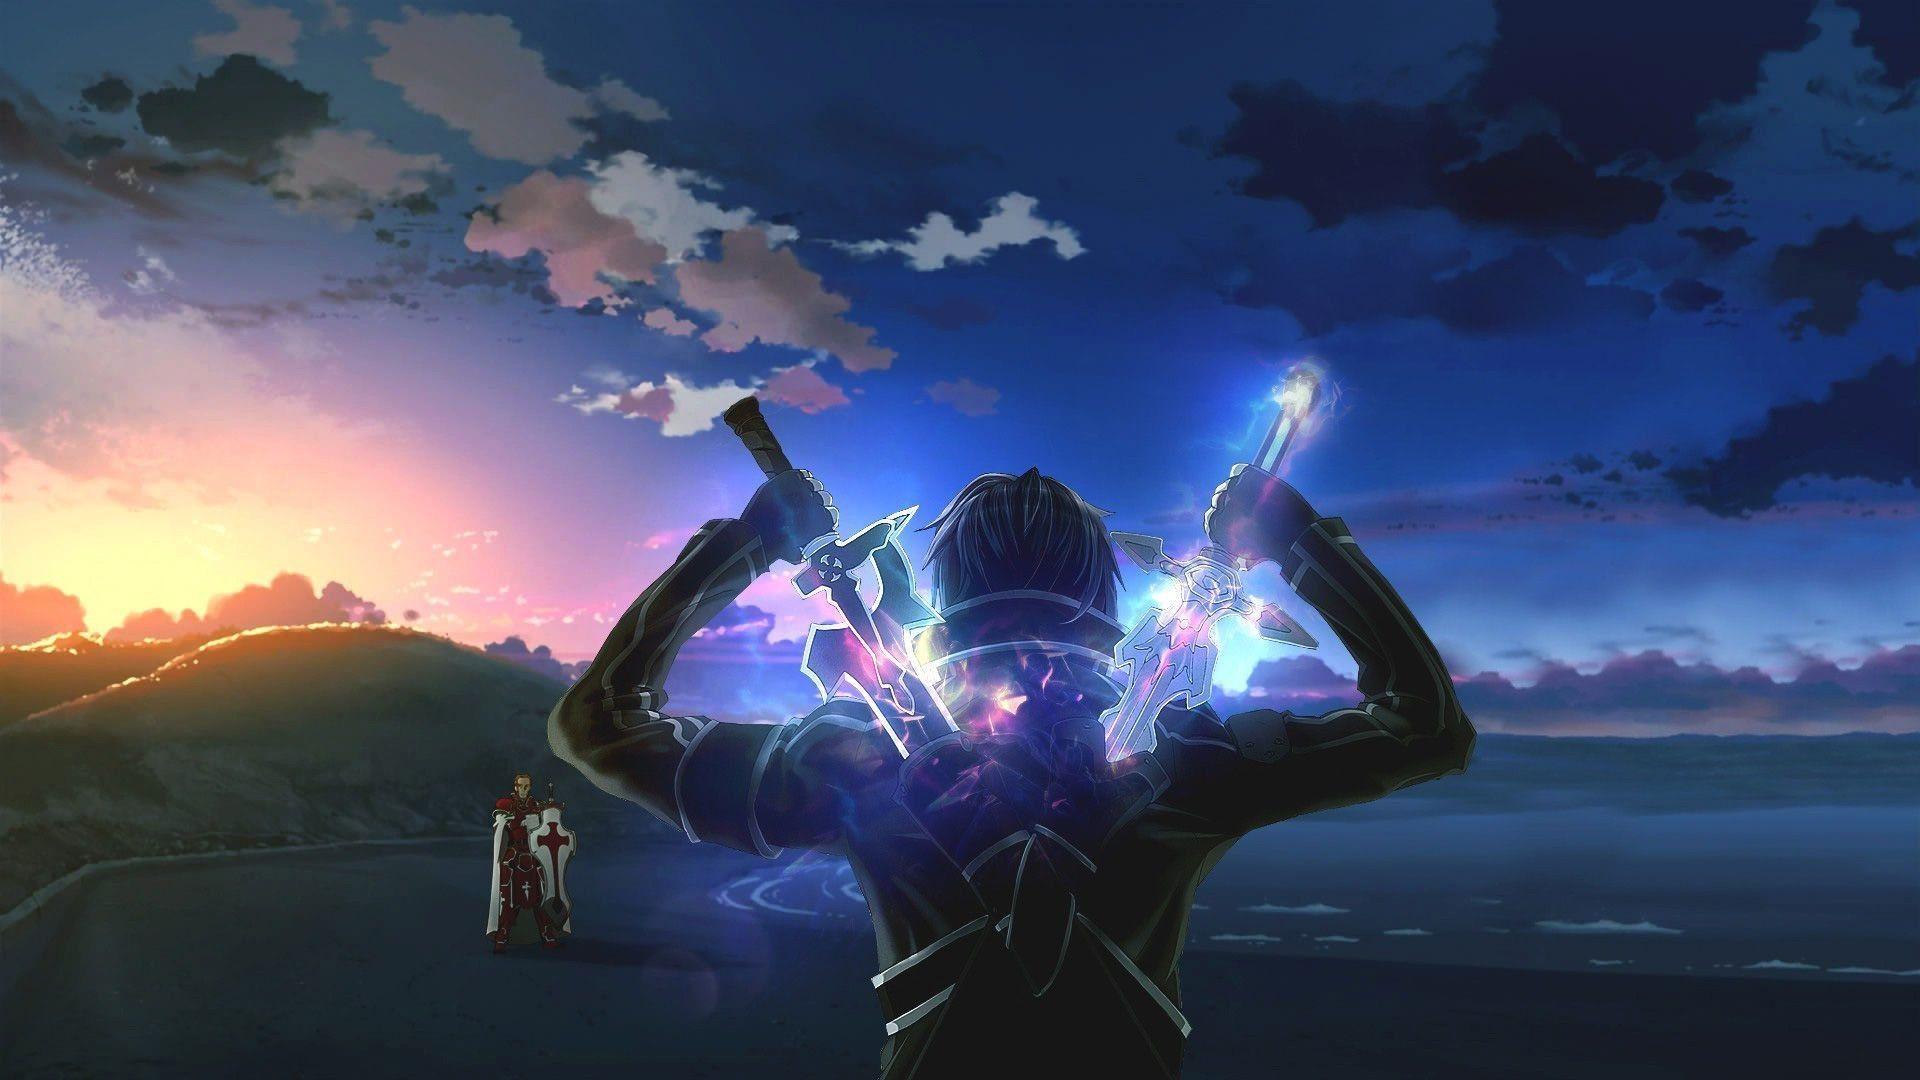 1920x1080 1980 X 1080 Hd Anime Wallpaper Sword Art Online Pemandangan Anime Sword Art Online Gambar